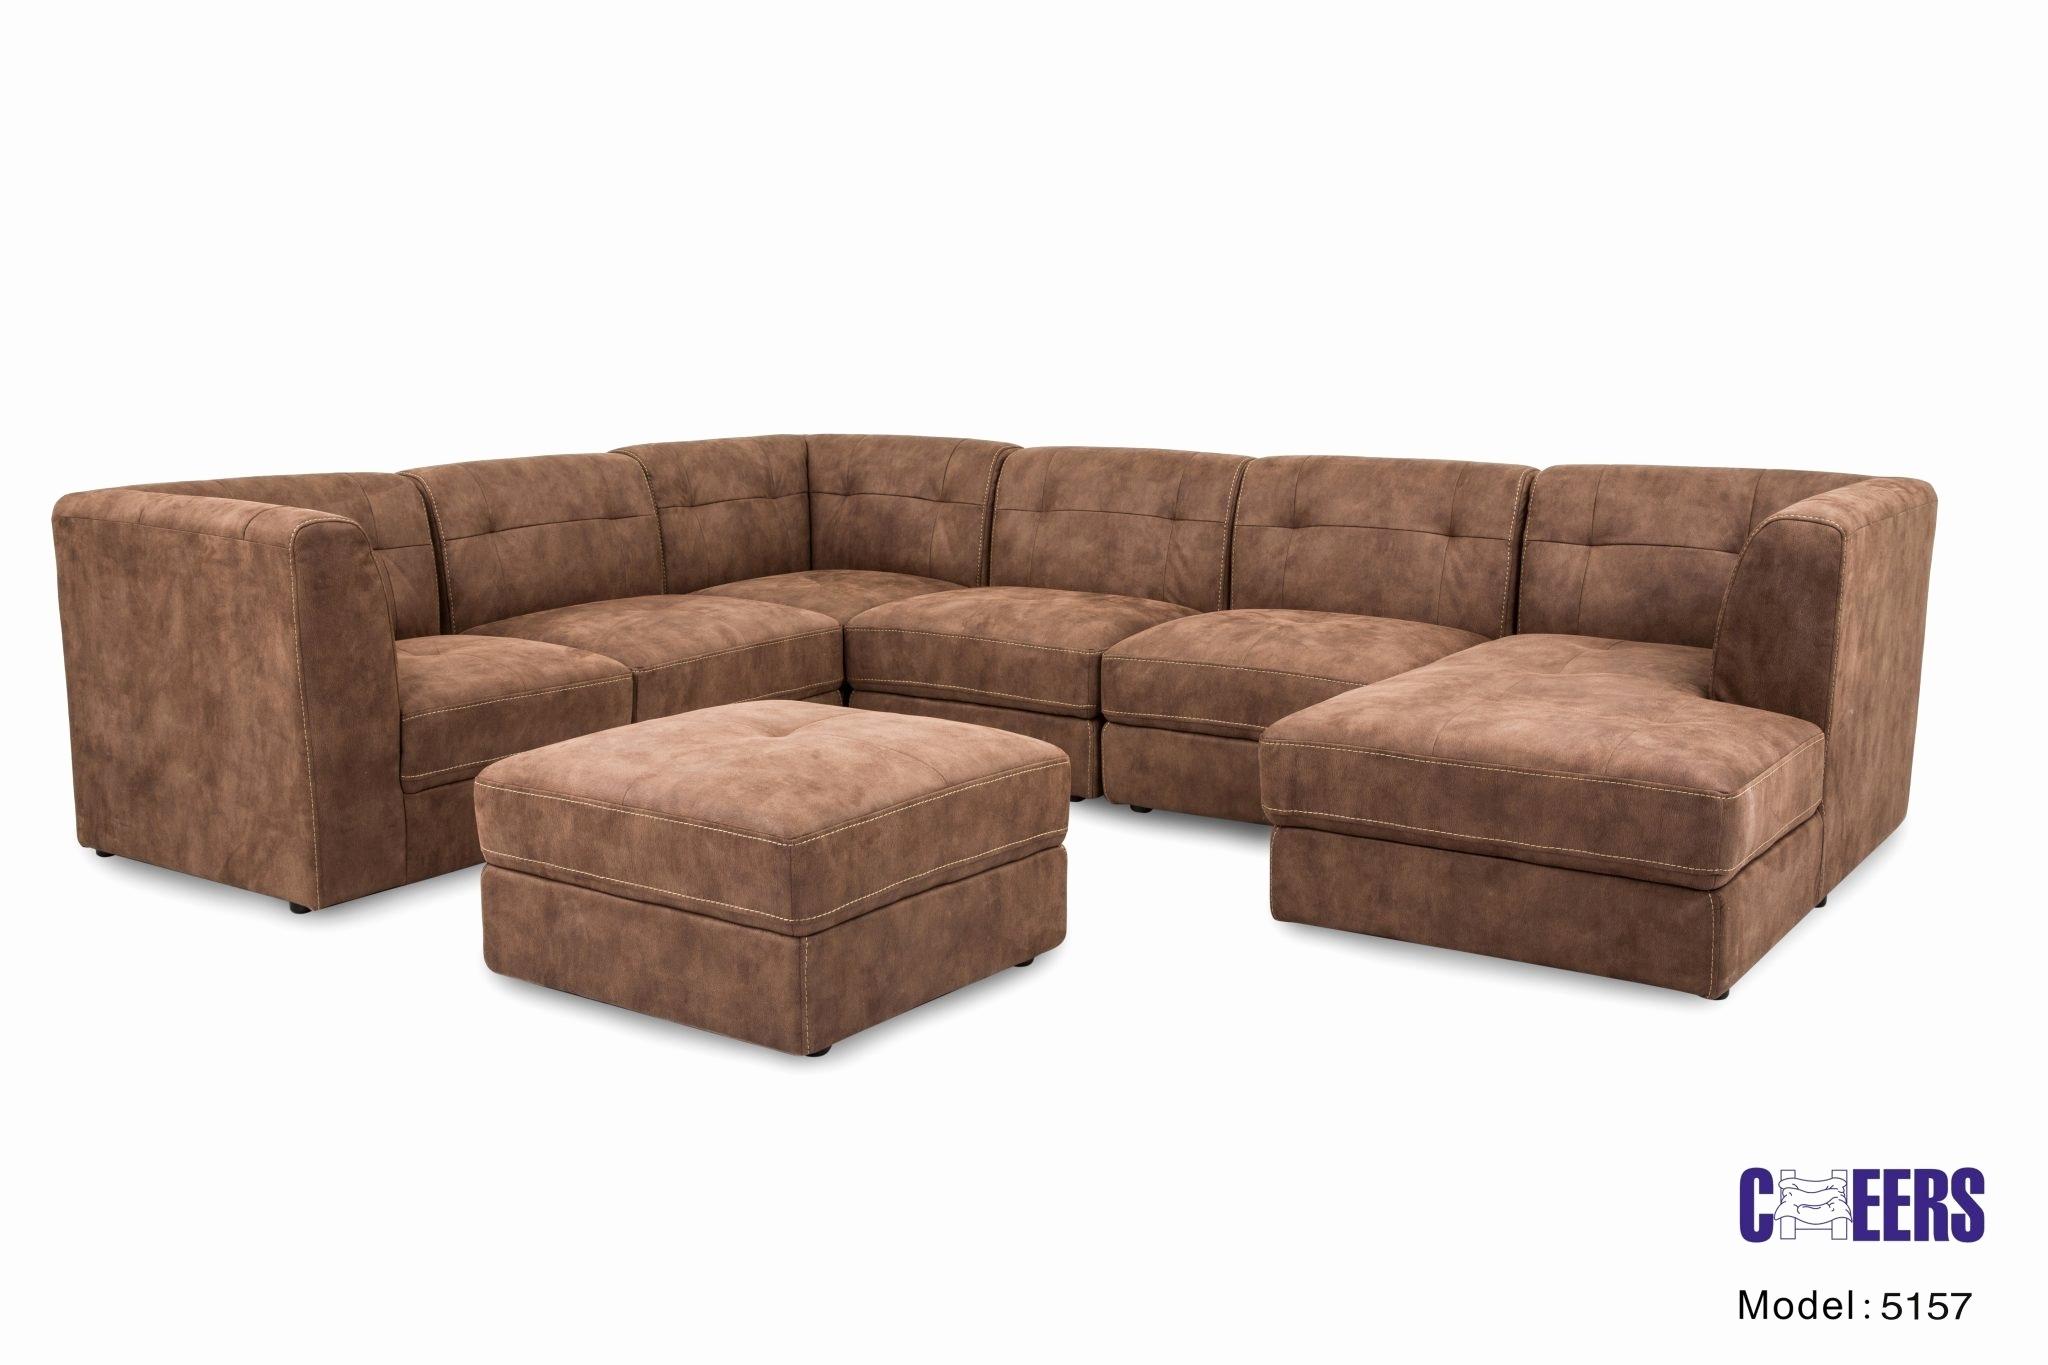 Luxury 6 Piece Sectional Sofa 2018 – Couches Ideas Regarding Sam Levitz Sectional Sofas (View 7 of 10)